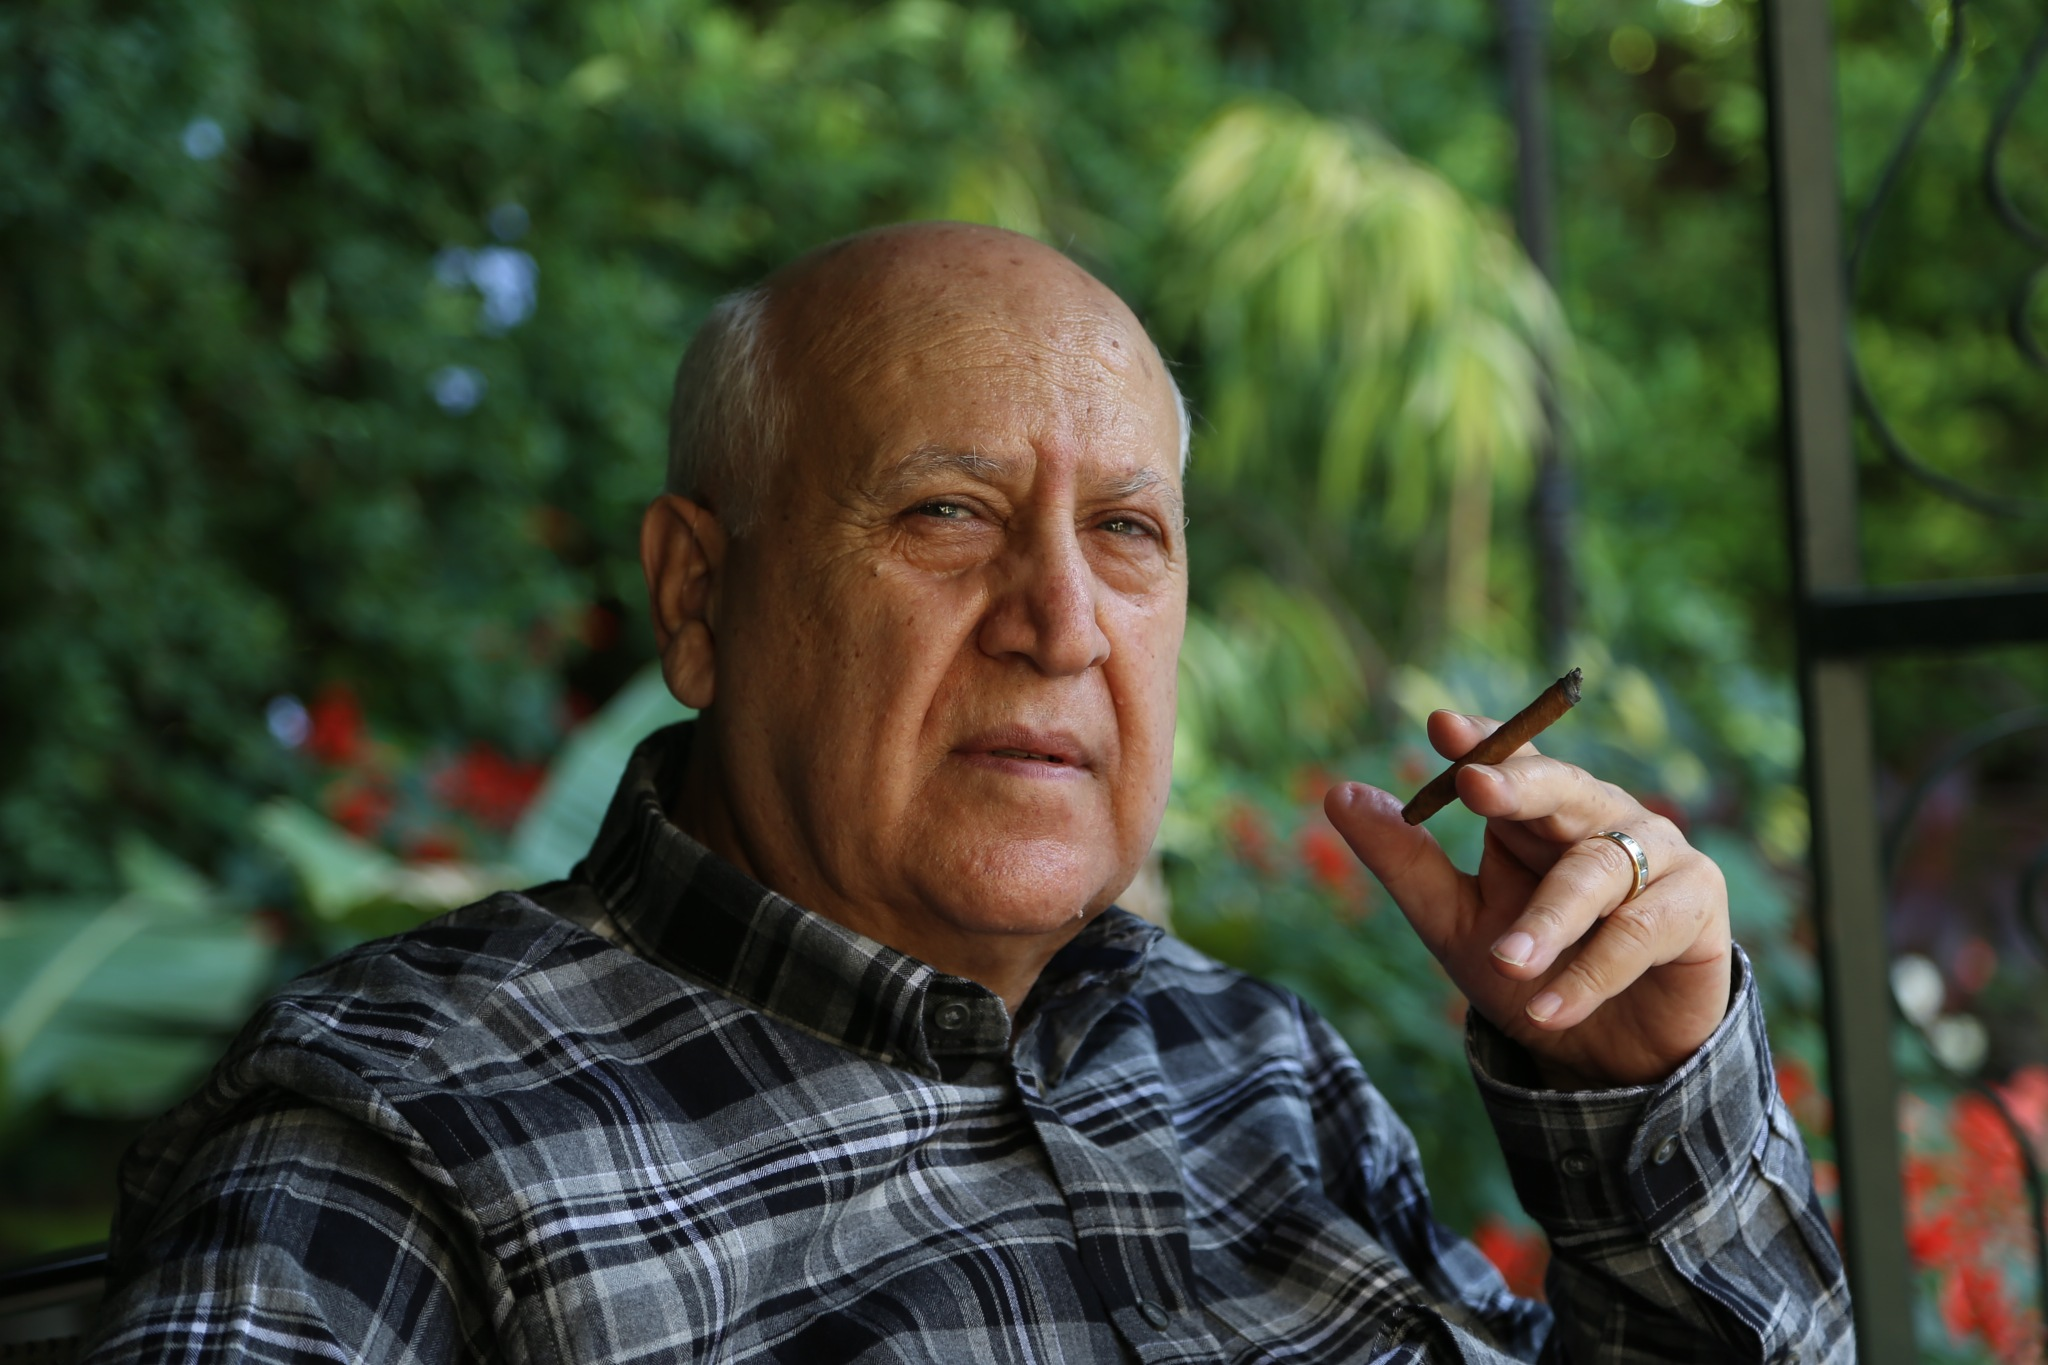 Enjoying a cigarillo by Tawfik W Dajani